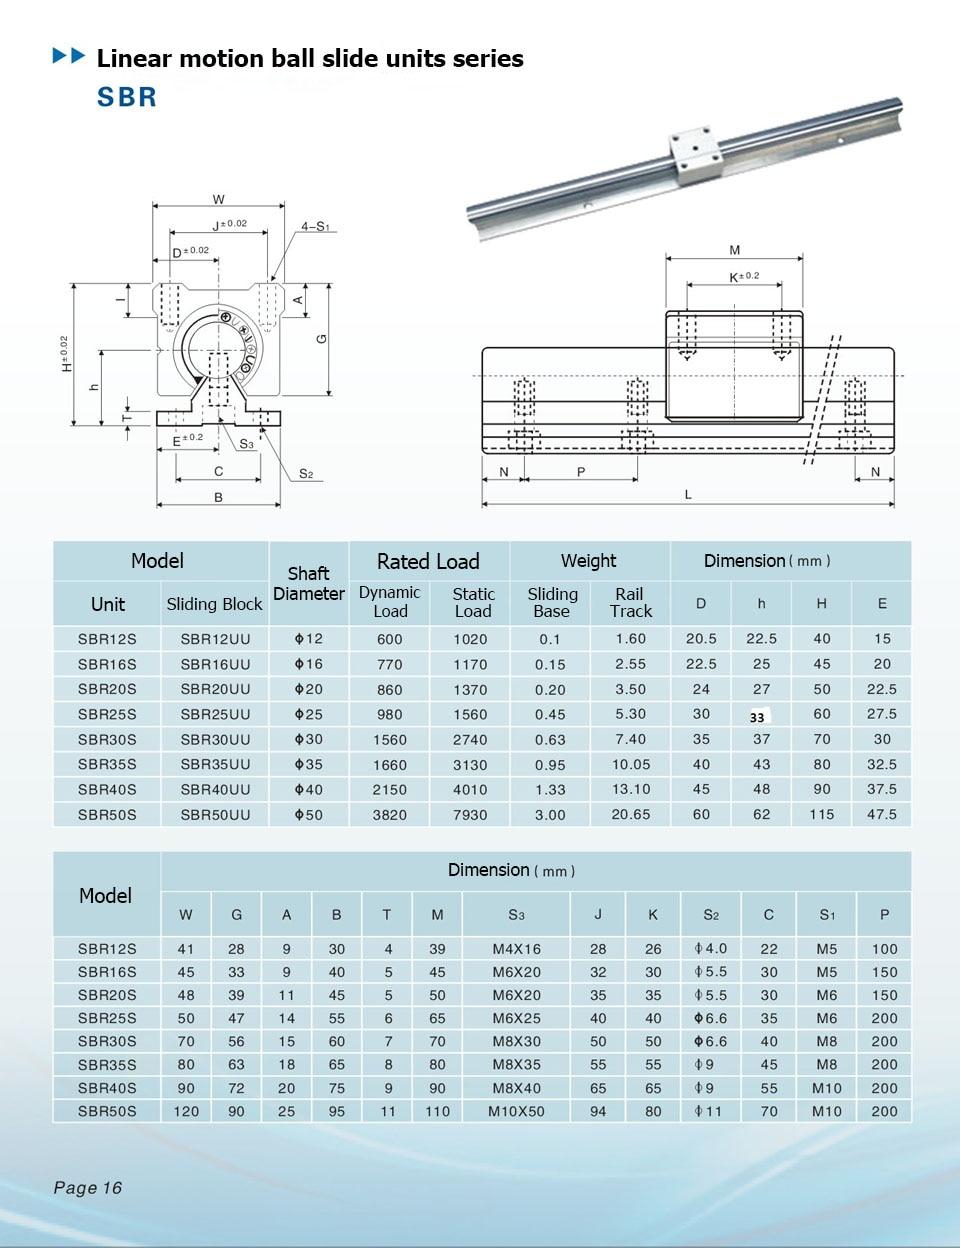 2X SBR20 L200-1500mm Linearwelle Linearführung Rail mit 4 Linearwagen CNC